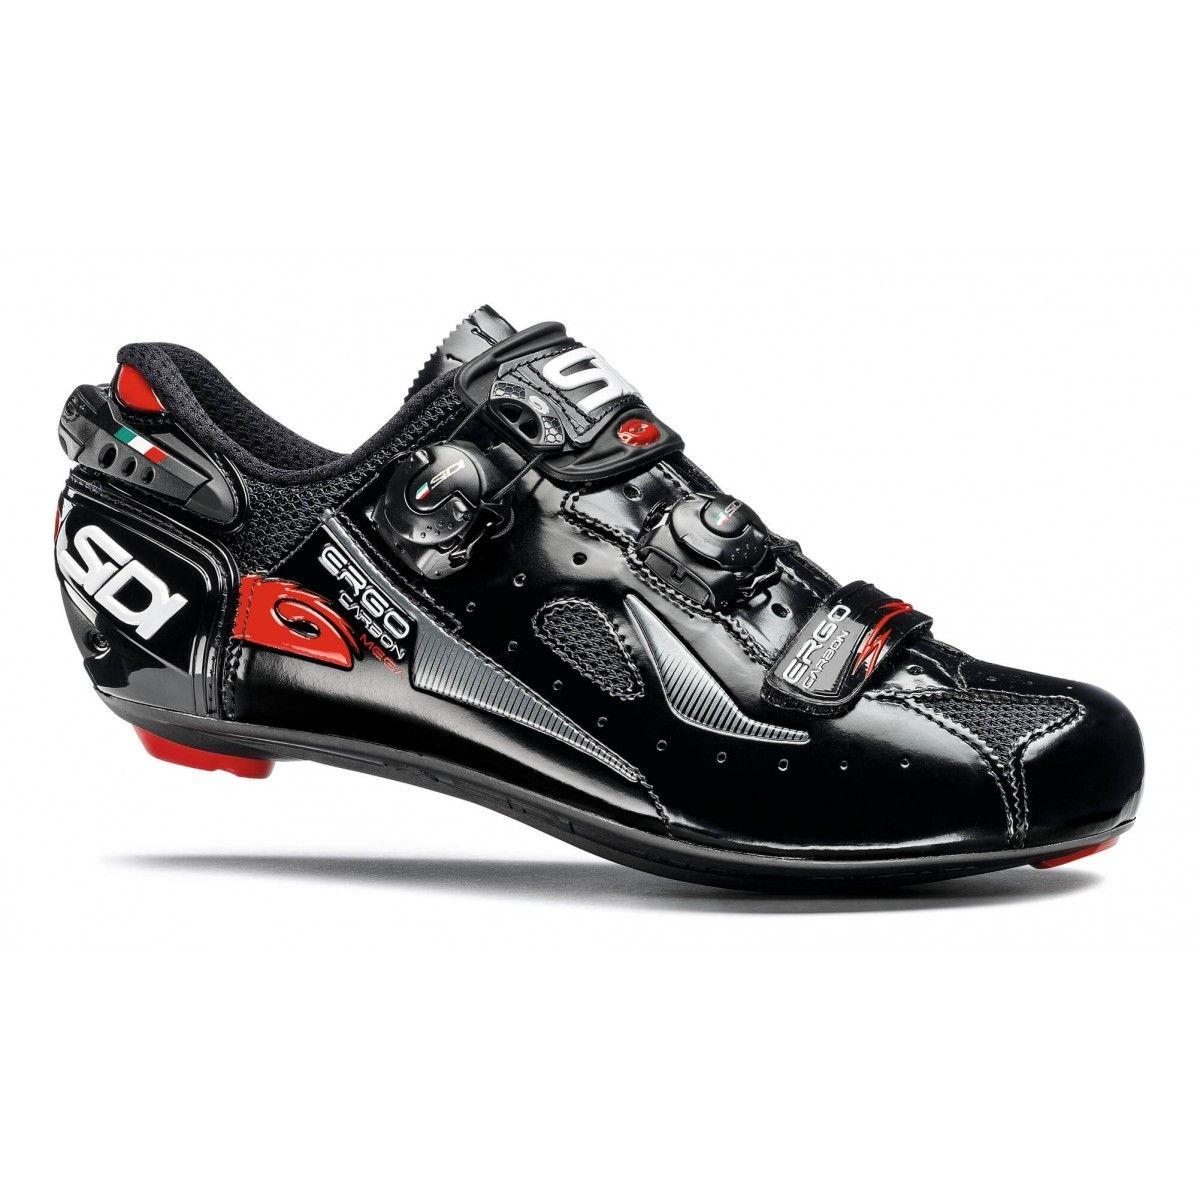 Chaussures route ERGO4 CARB Cyclisme Sidi